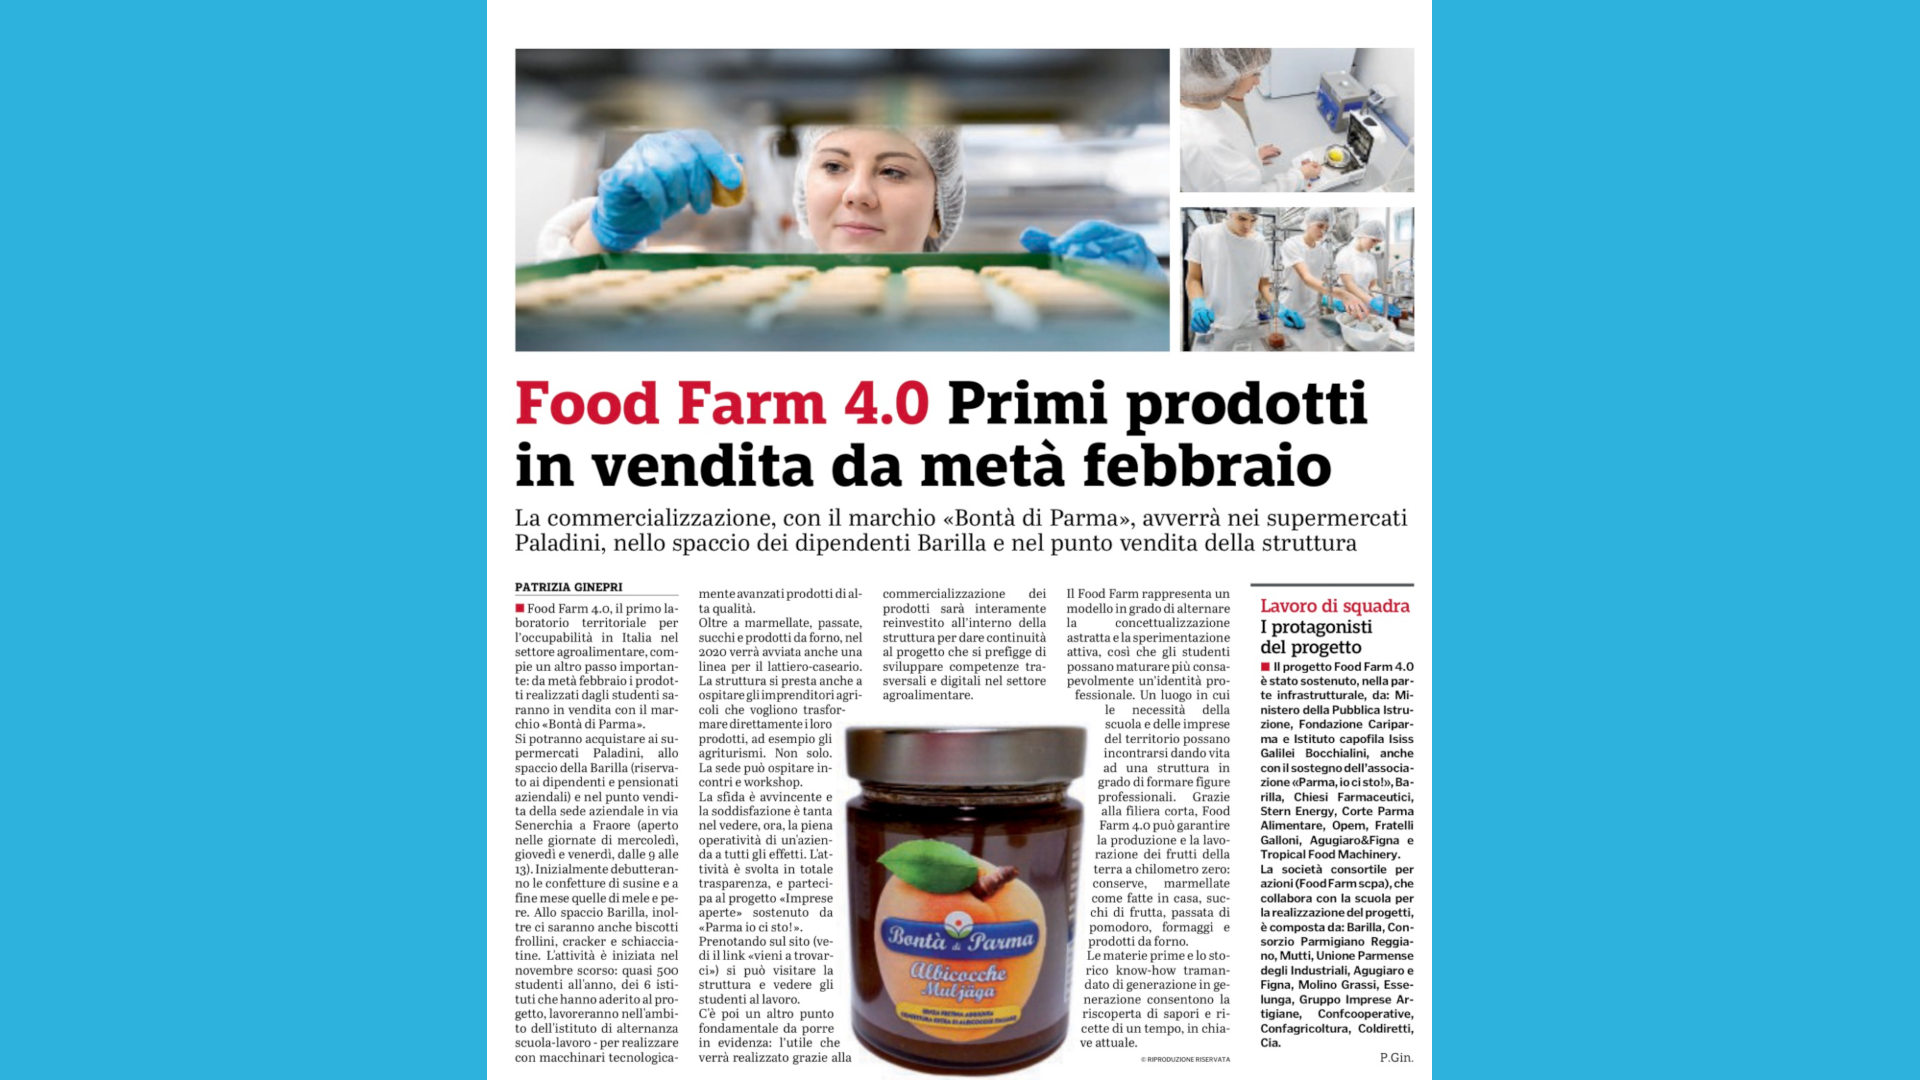 Vendita Prodotti Food Farm 4.0